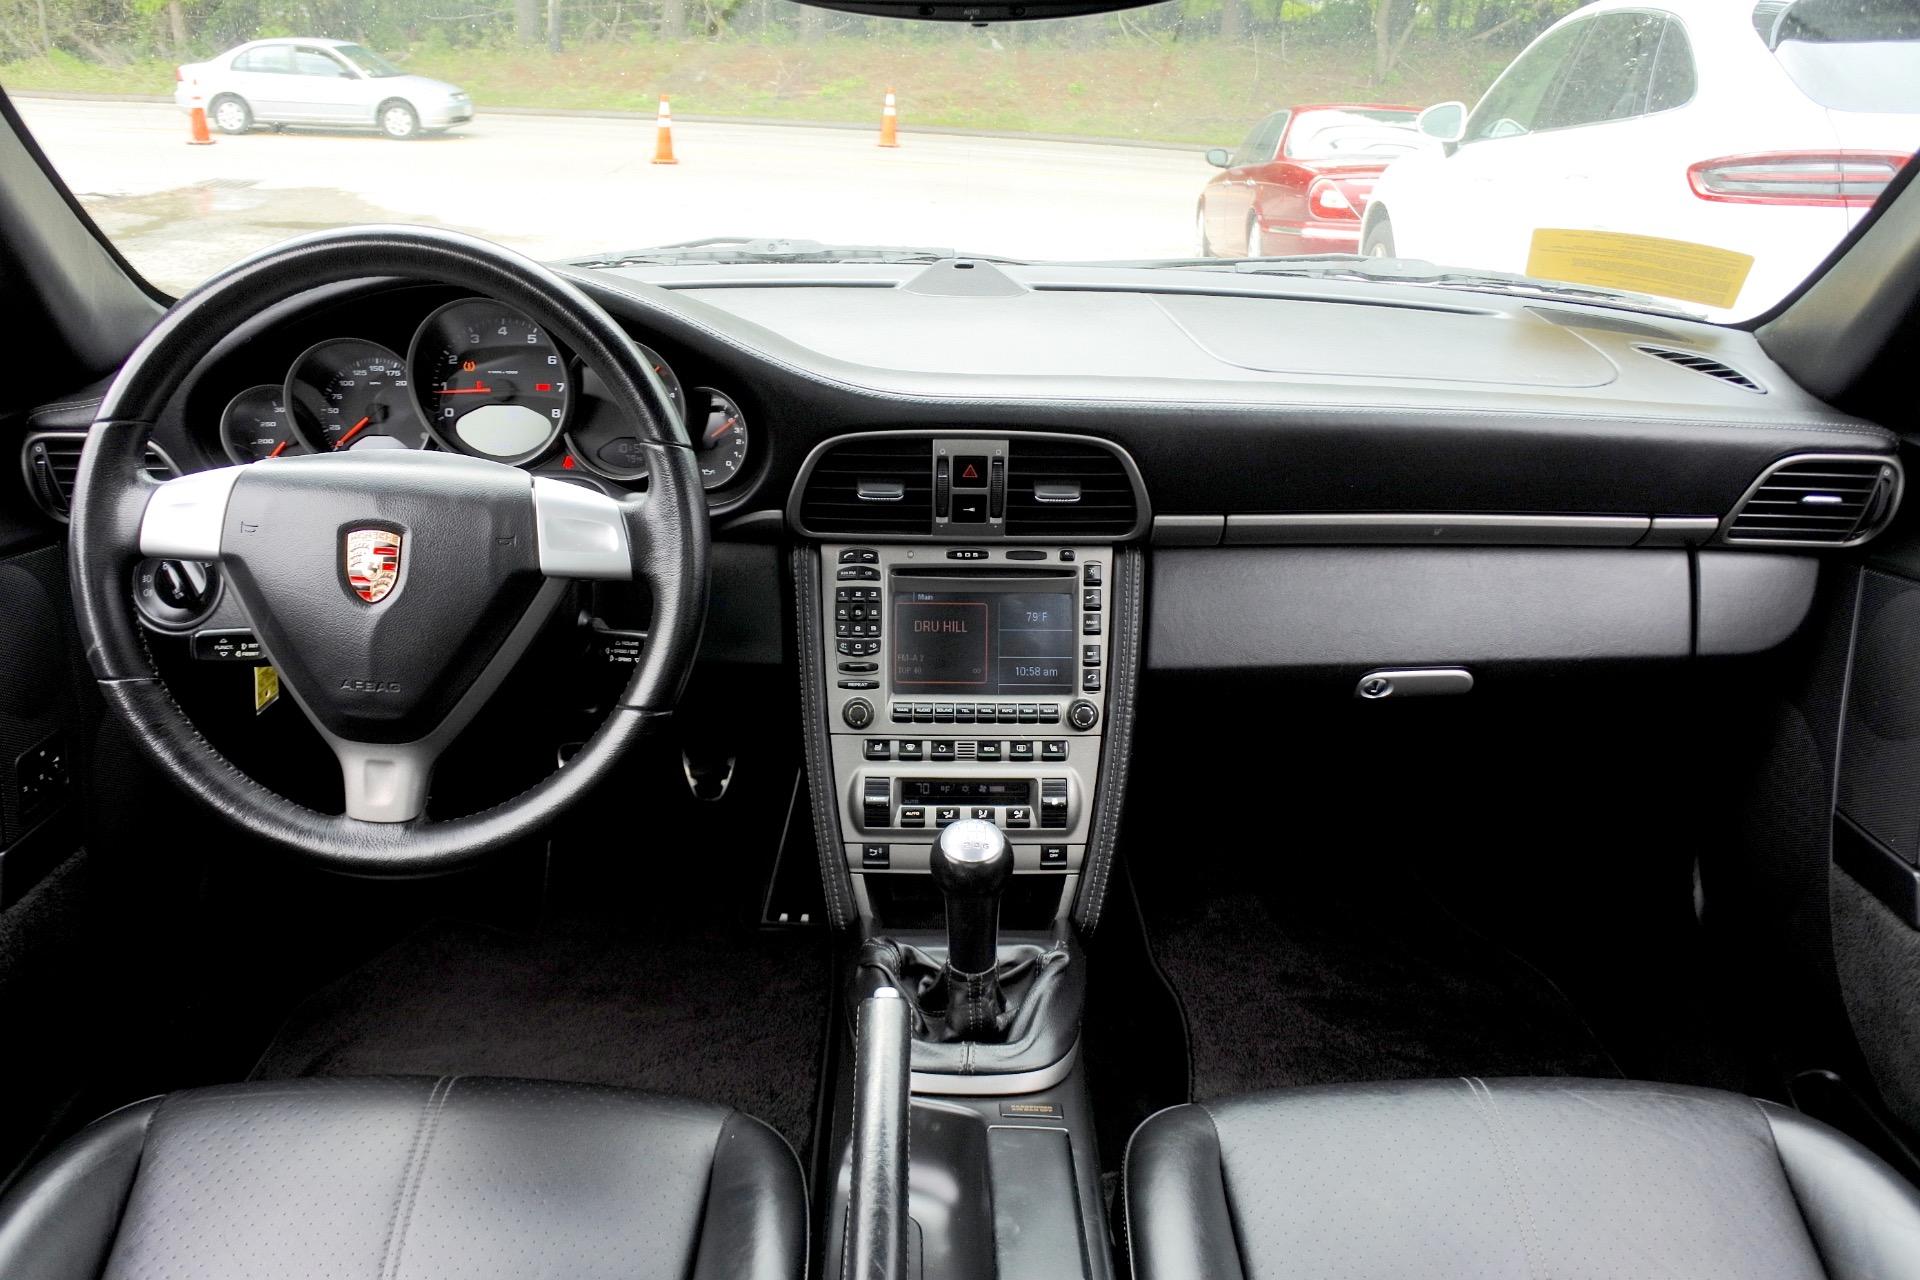 Used 2006 Porsche 911 Carrera 4 Used 2006 Porsche 911 Carrera 4 for sale  at Metro West Motorcars LLC in Shrewsbury MA 9